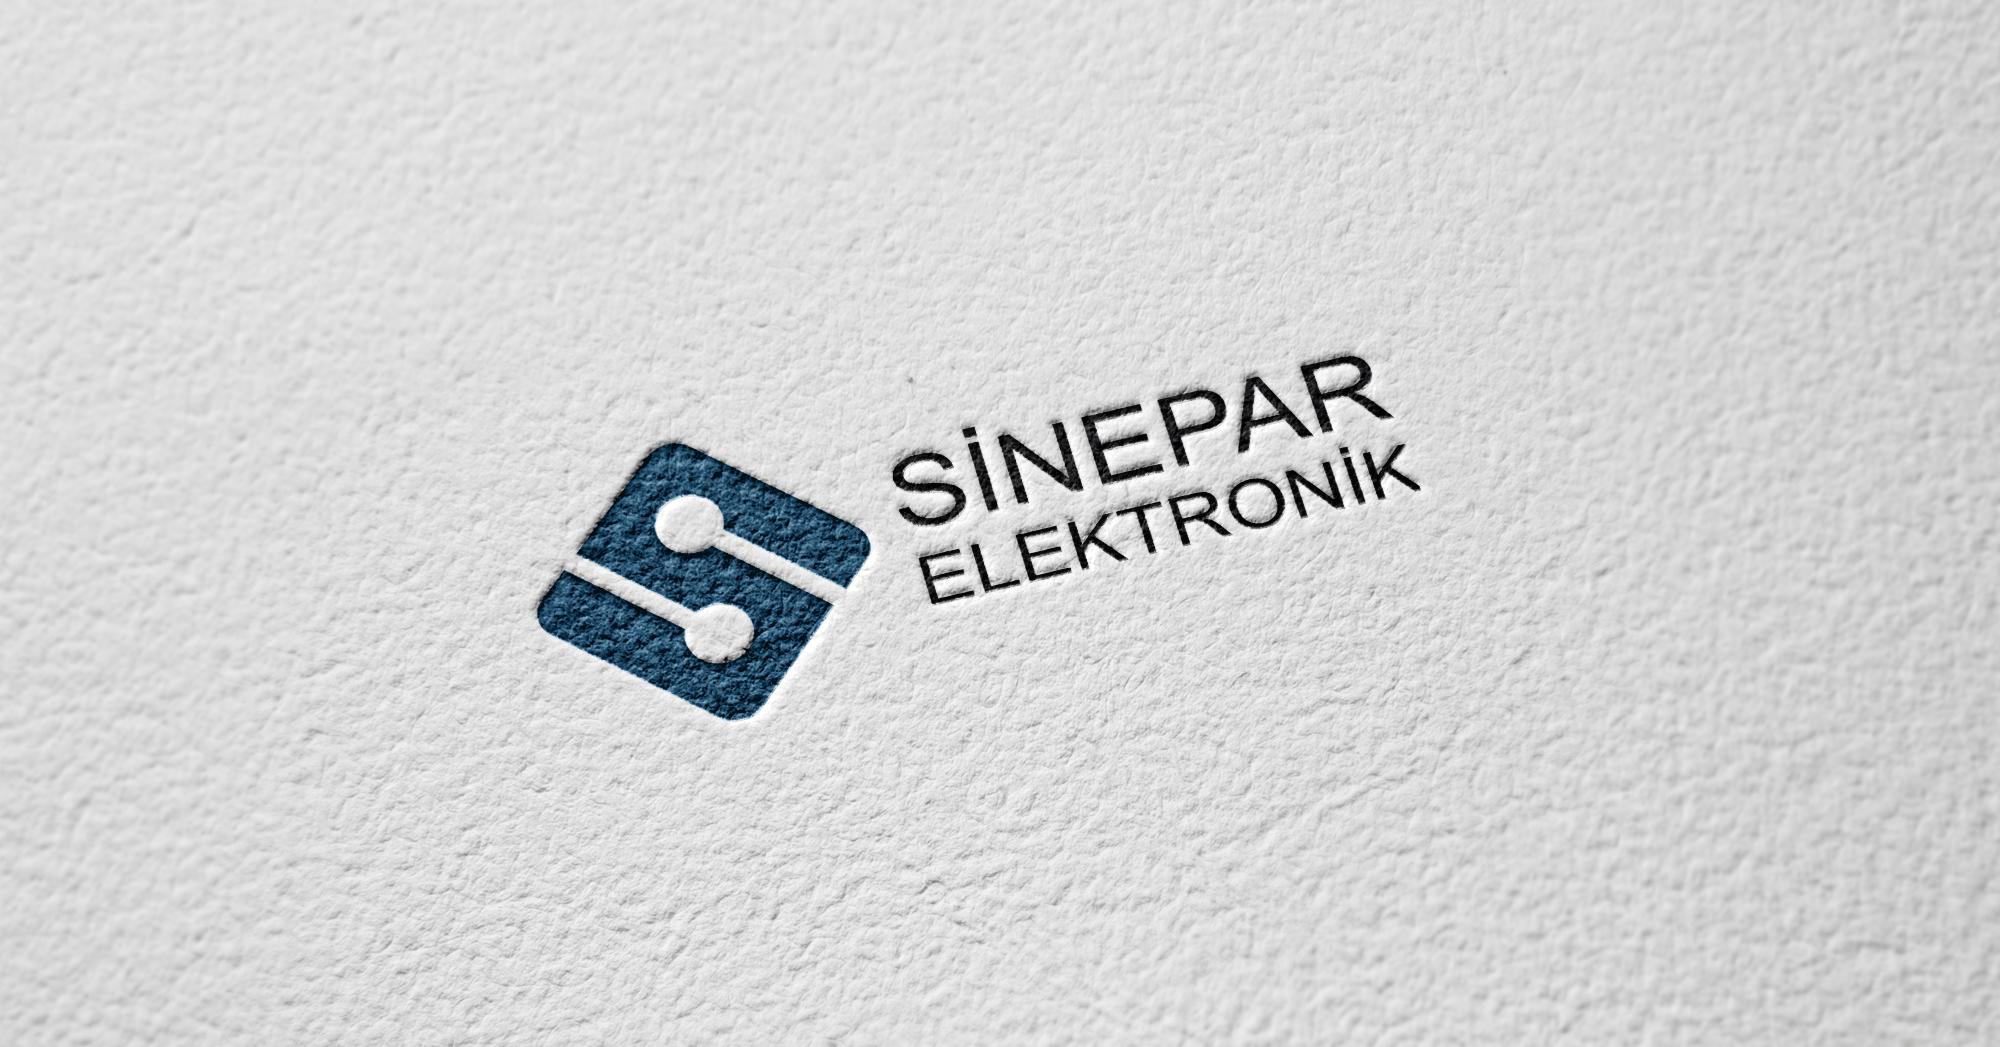 Sinepar Elektronik